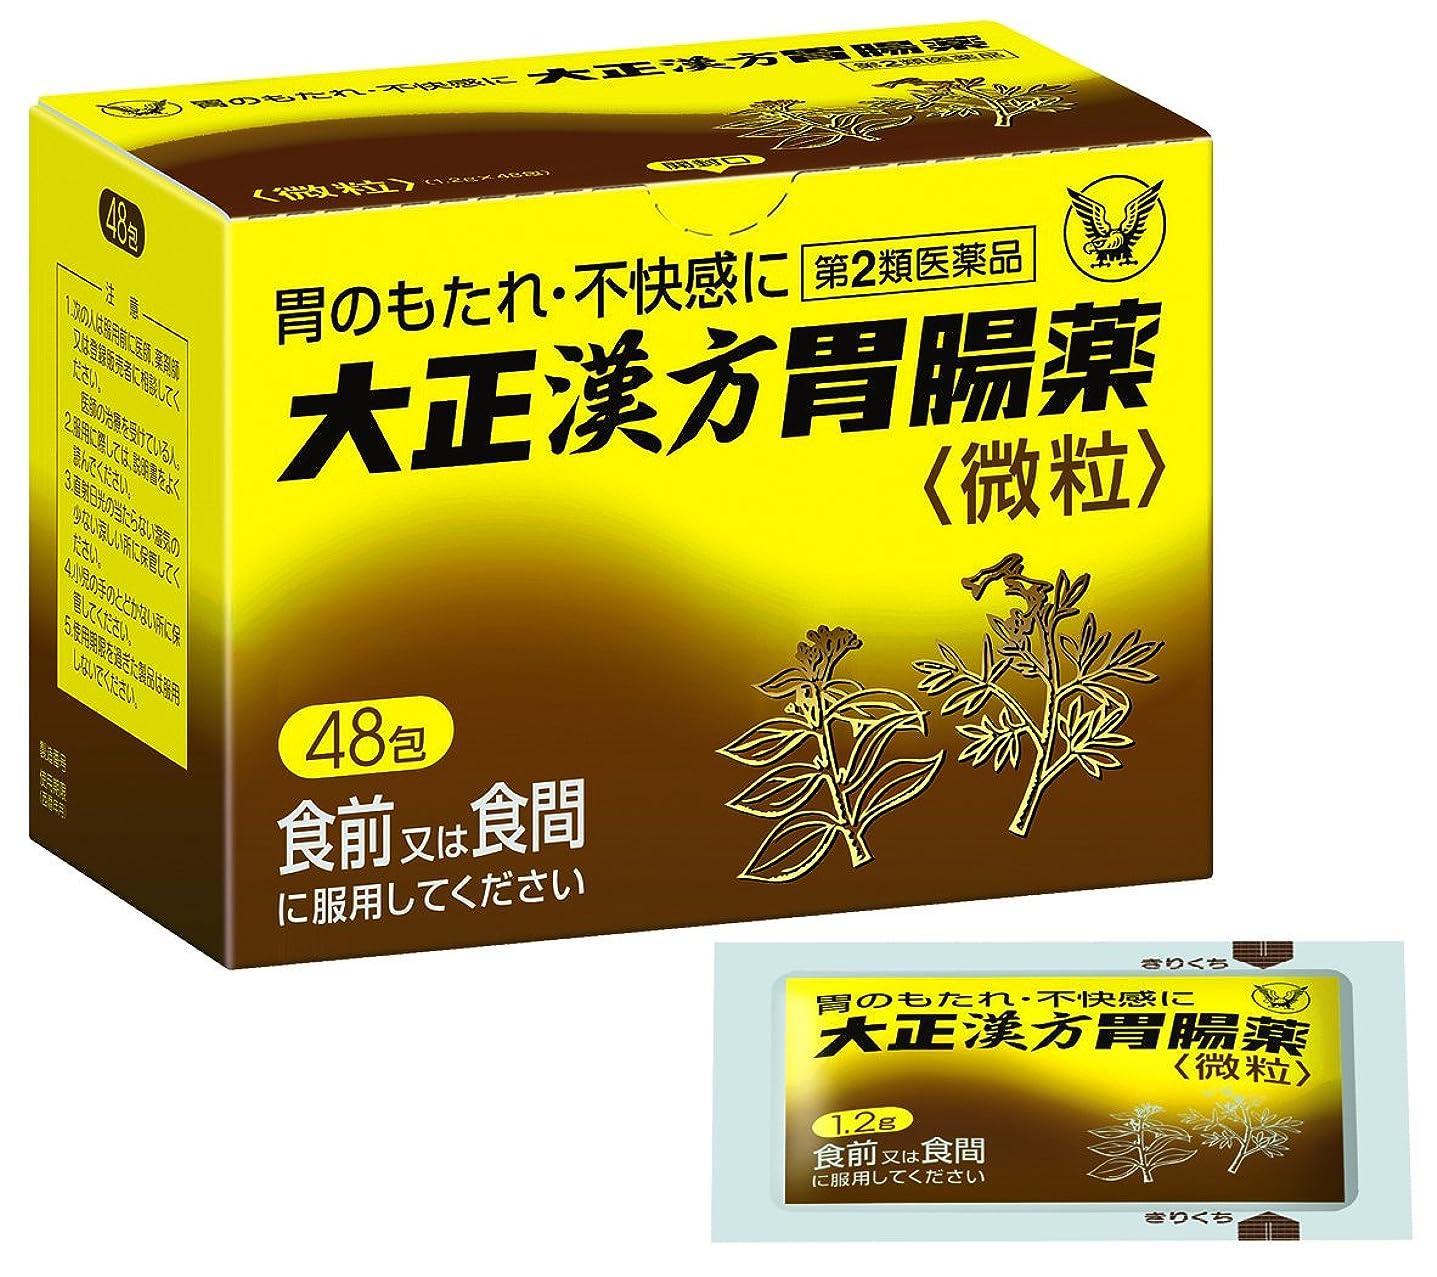 農夫構想する夕暮れ【第2類医薬品】大正漢方胃腸薬 48包